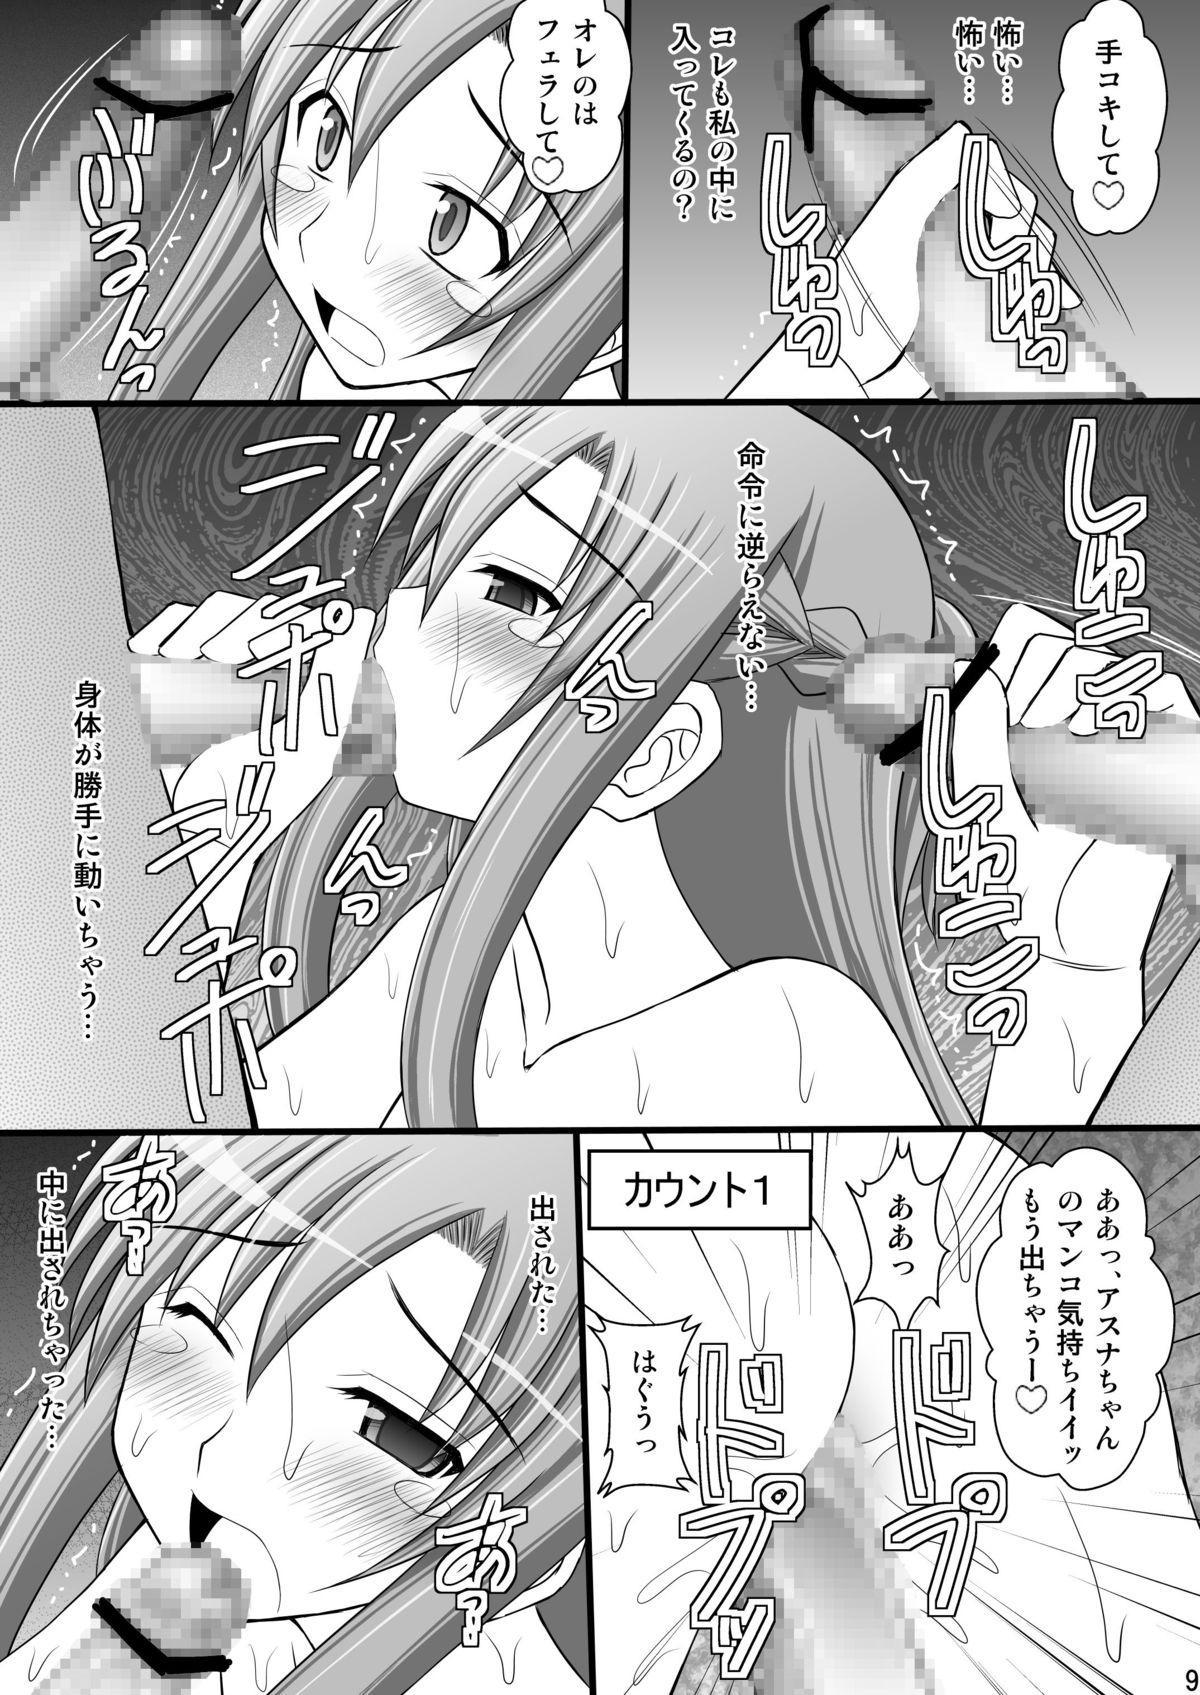 Toraware Hime III: Hostage Princess III 7